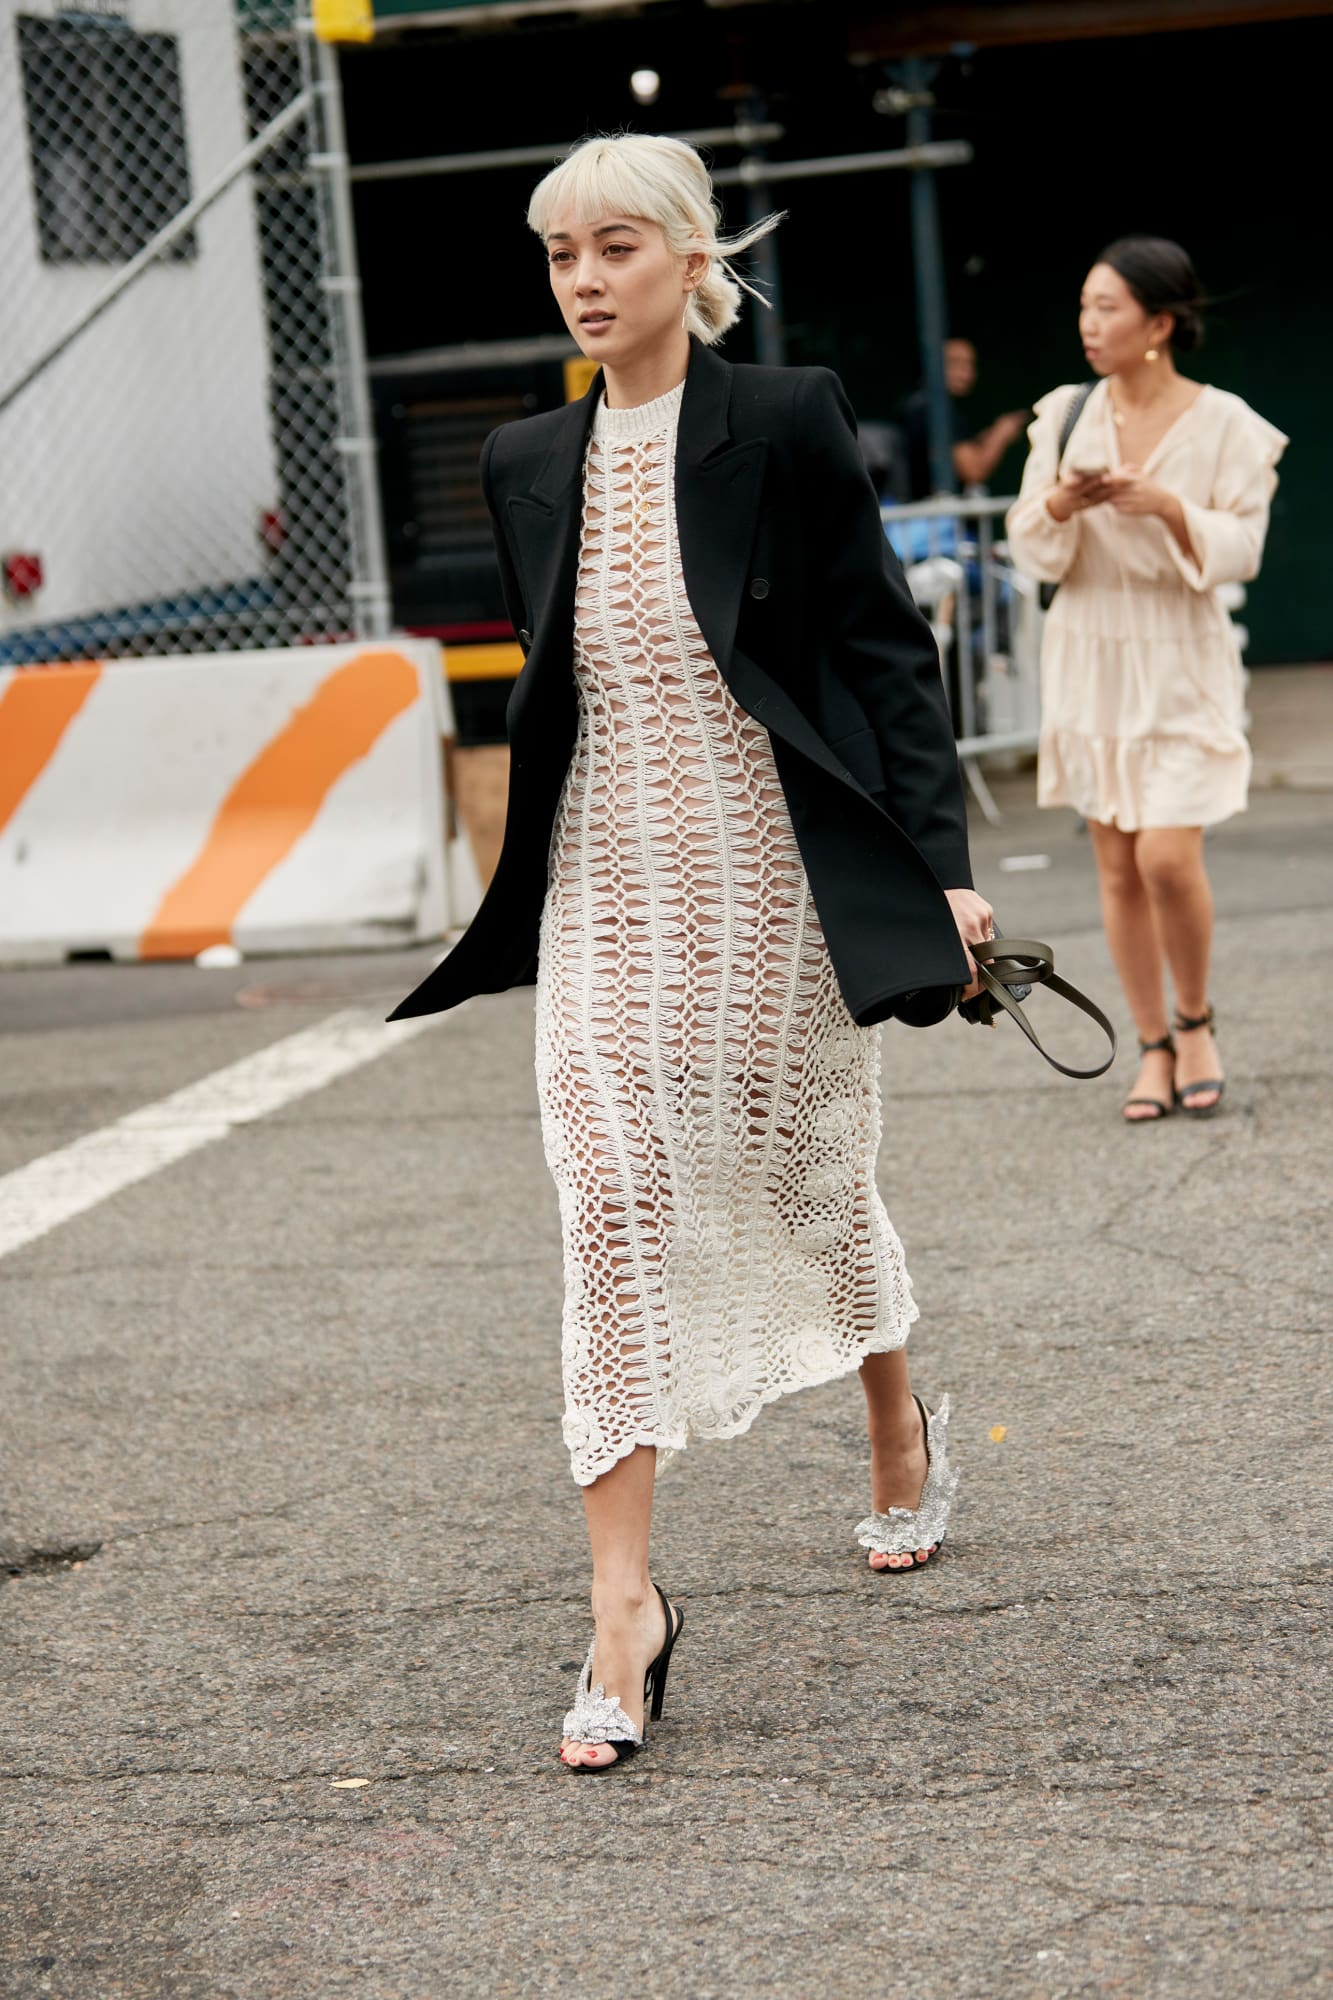 new-york-fashion-week-street-style-spring-2019-day-3-50.jpg